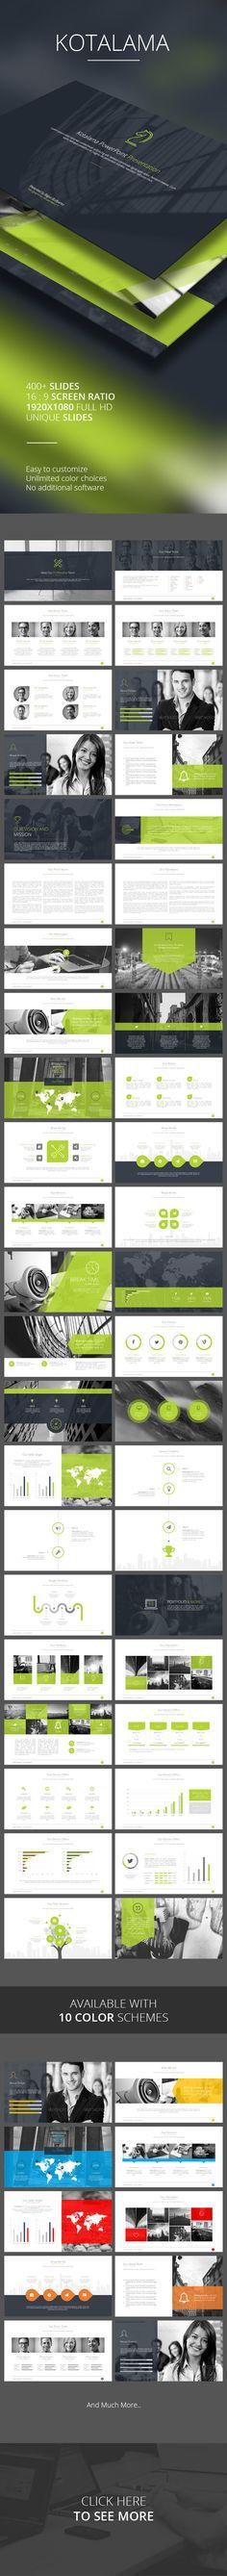 tinker - powerpoint template | creative powerpoint templates and, Powerpoint templates